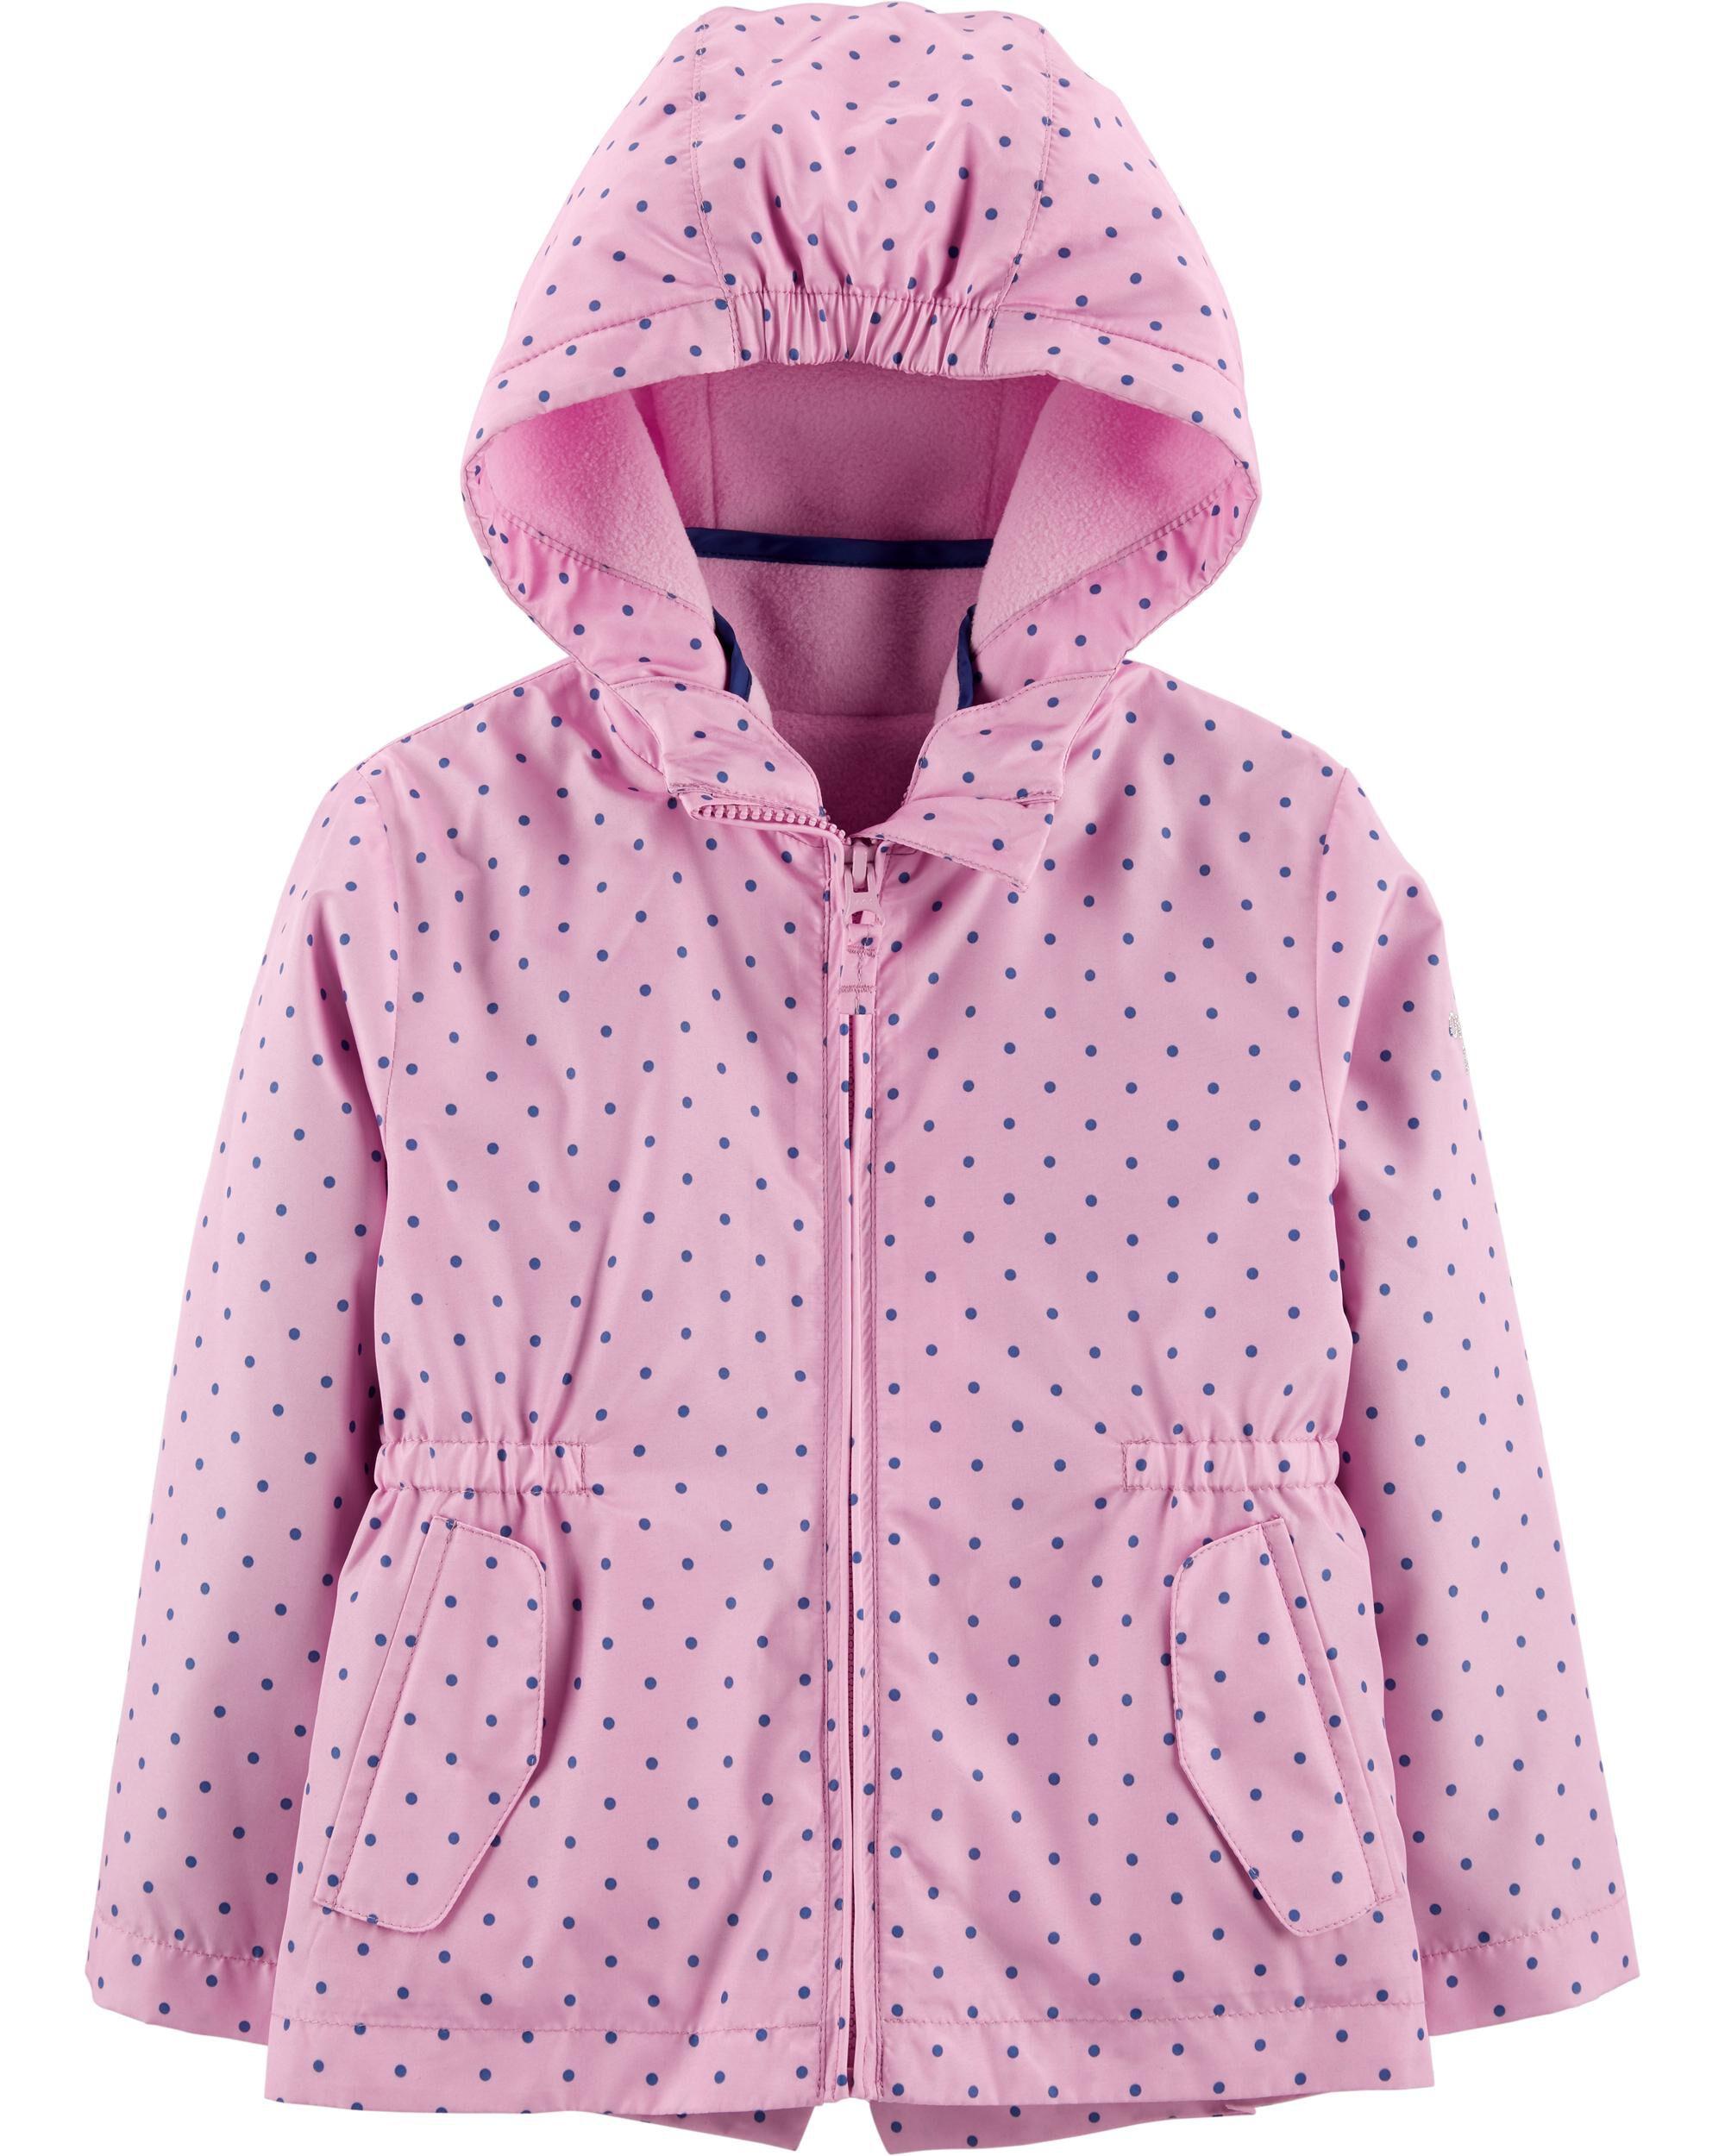 Baby & Toddler Clothing Girls' Clothing (newborn-5t) Girls Lightweight Jacket 6-9 Months